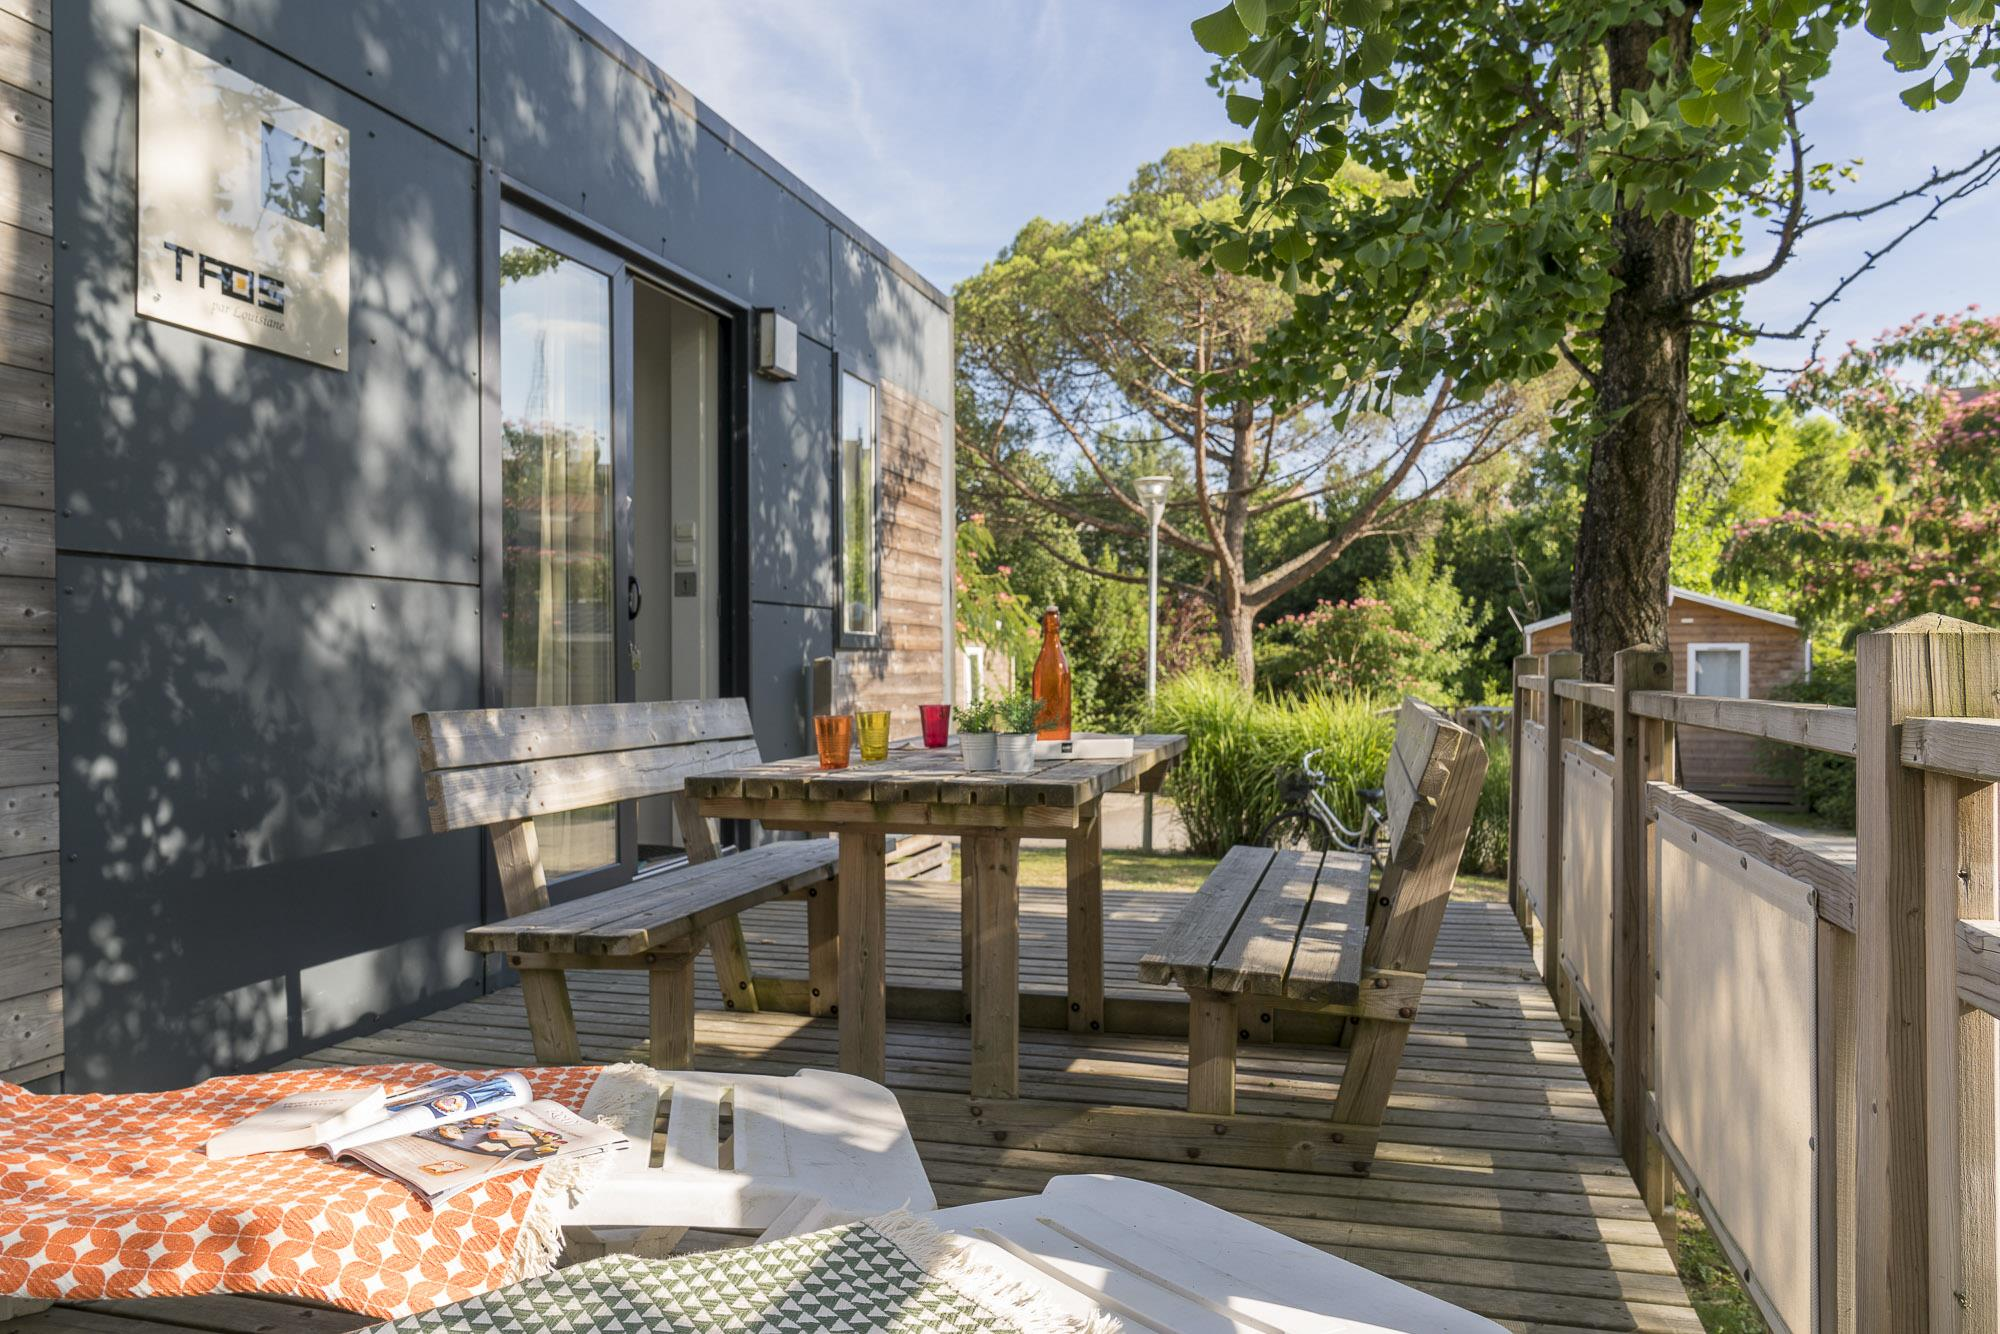 Location - Cottage Carrousel 3 Chambres + 2 Salles De Bain 40M2 - Nantes Camping